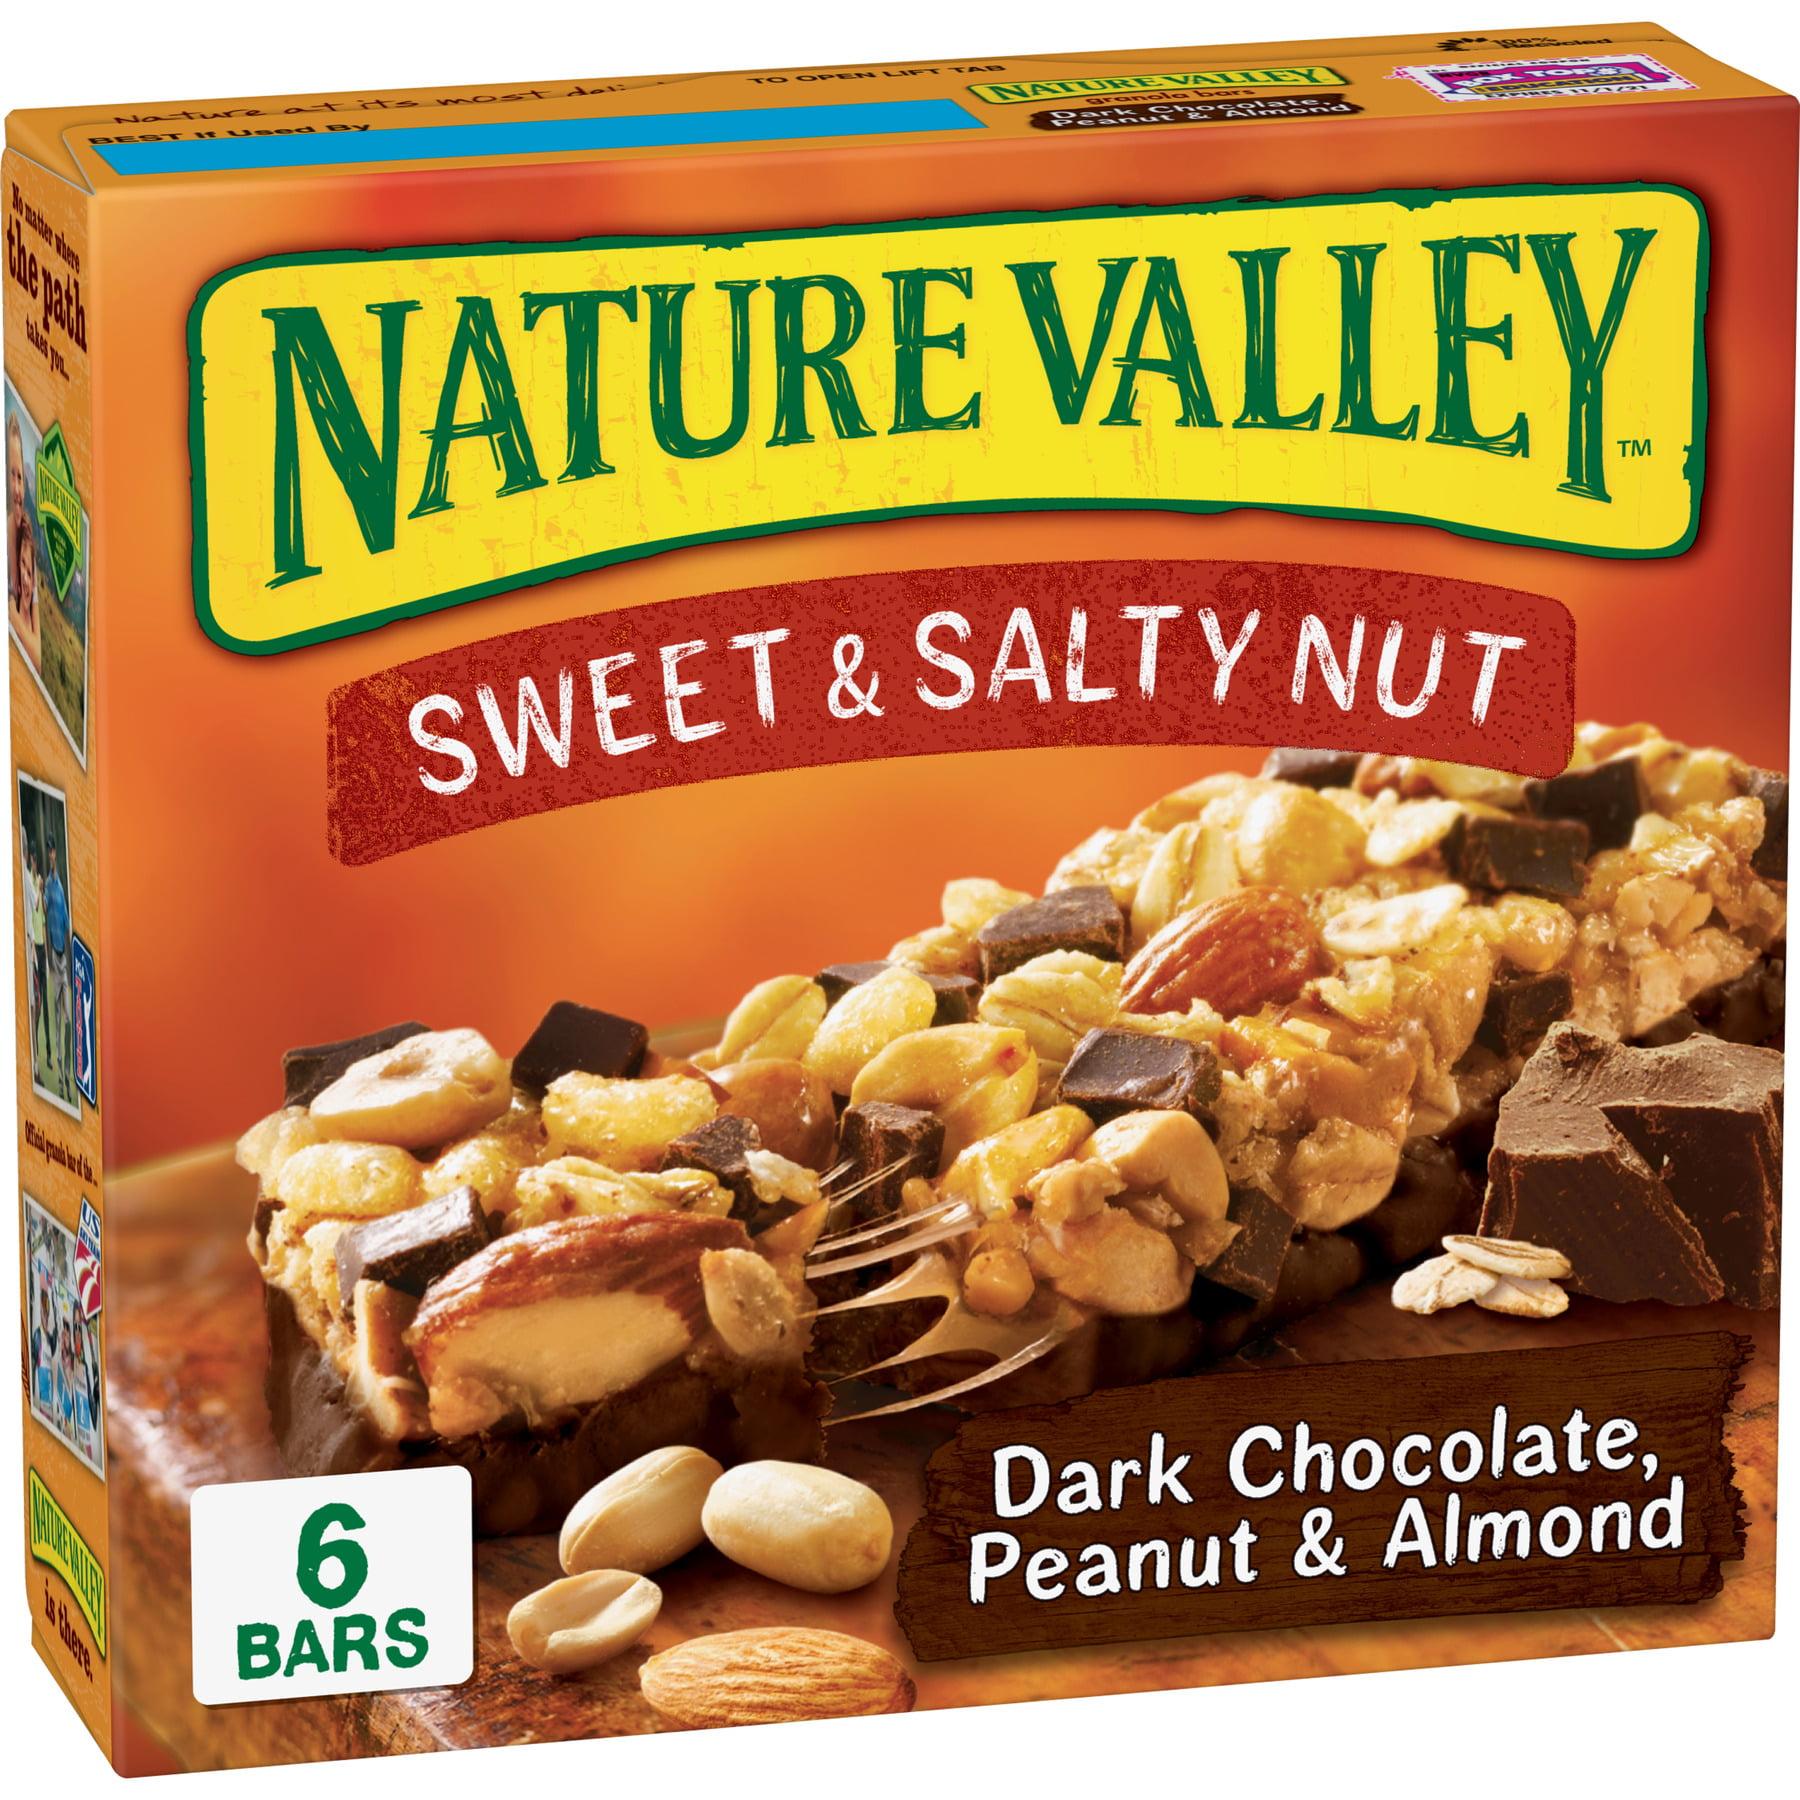 Nature Valley, Sweet & Salty Nut, Dark Chocolate Peanut & Almond, 6 Ct